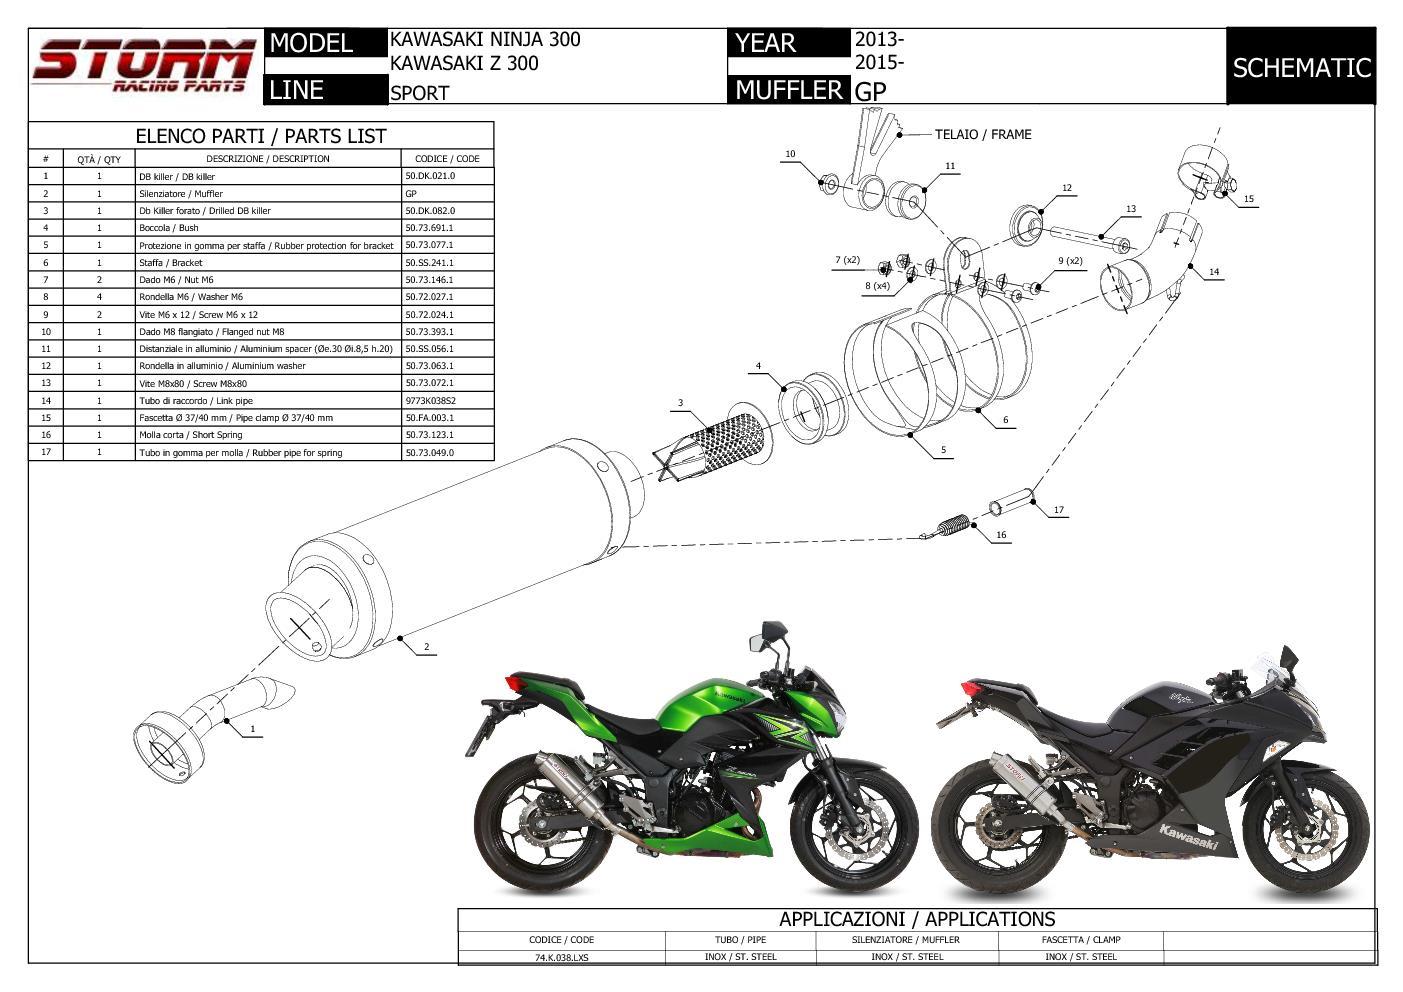 Scarico Storm By Mivv Gp Acciaio Inox Per Kawasaki Z300